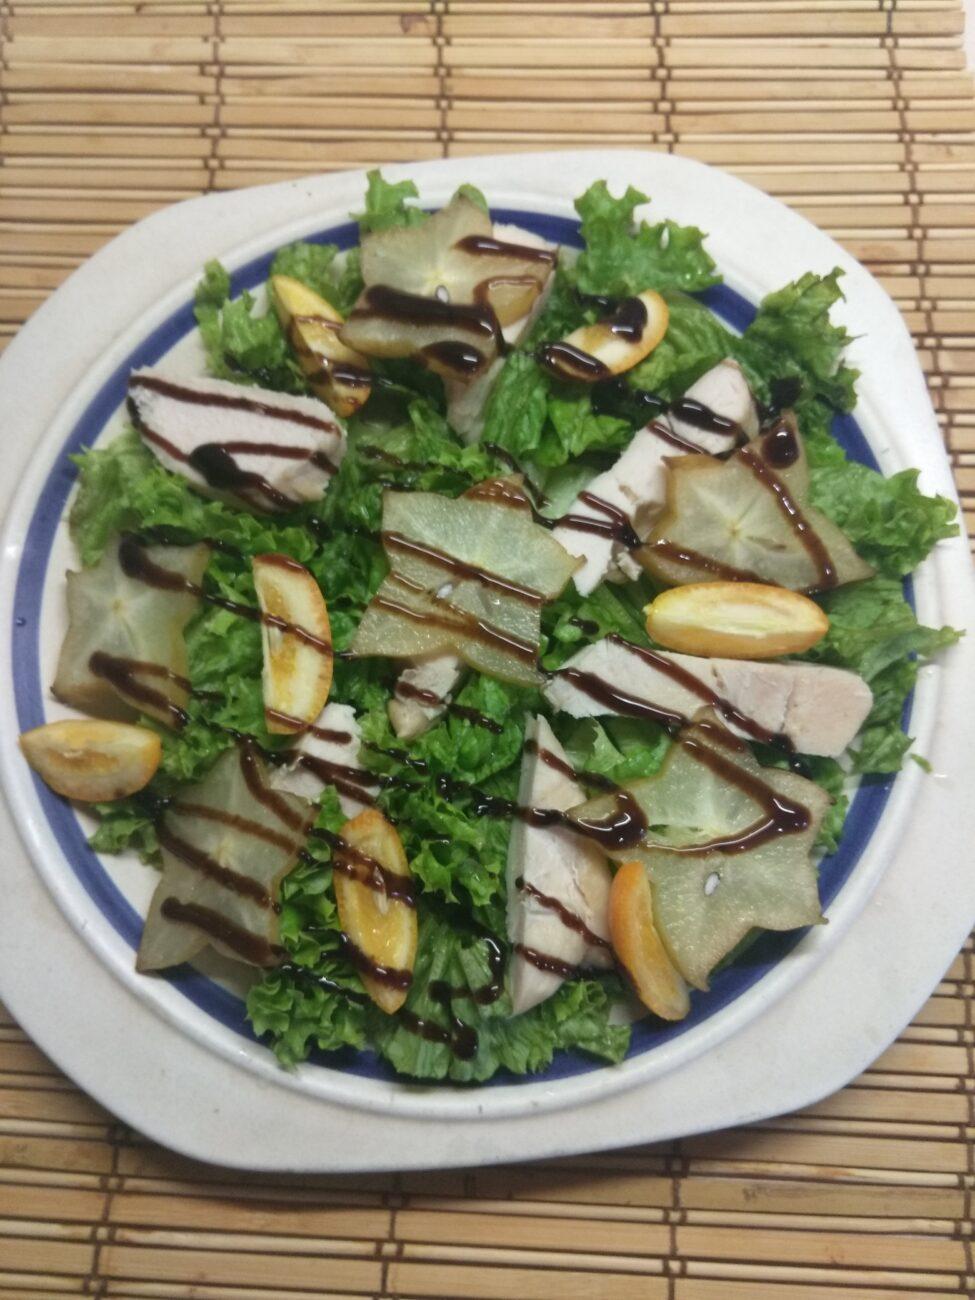 Салат из запеченного филе индейки, карамболя и кумквата